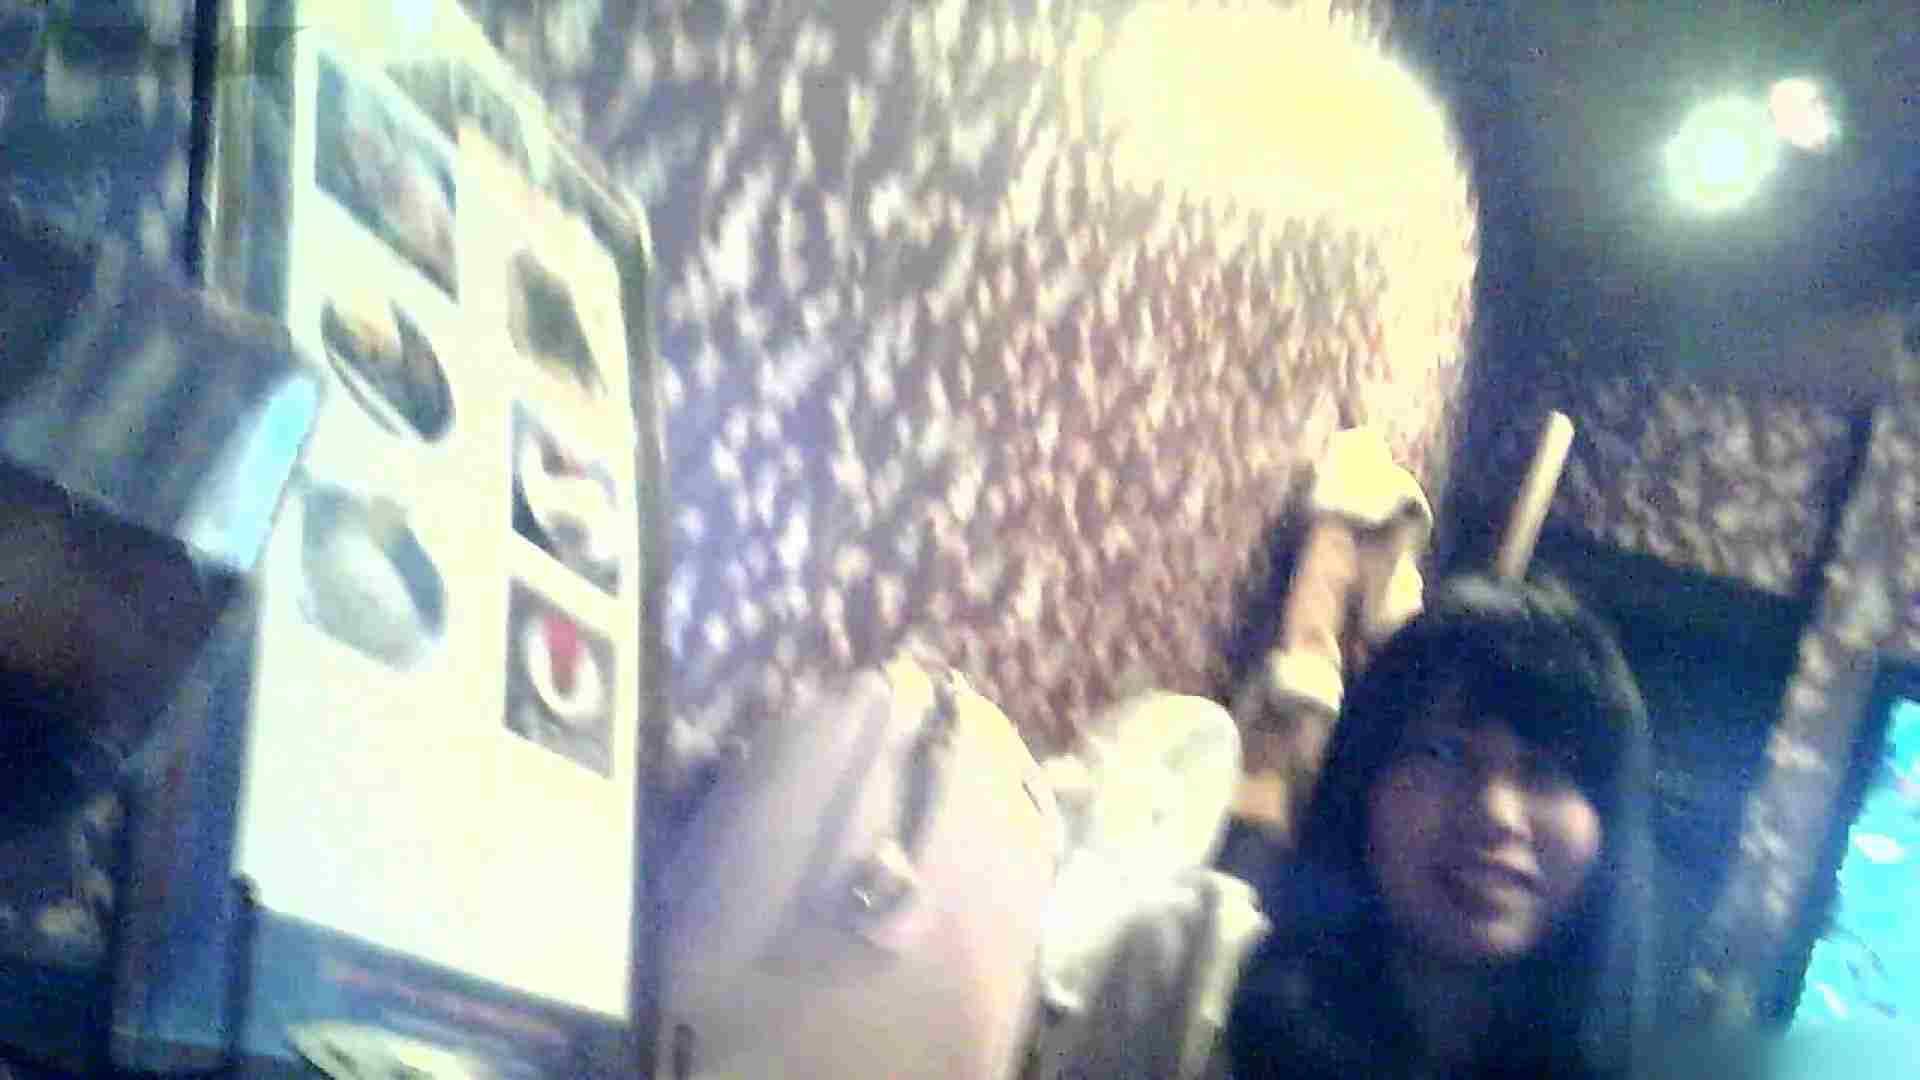 ▲2017_05位▲ 学園アイドル美人女子大生!❶4人厳選詰合せVol.49 人気作   女子大生  113画像 31